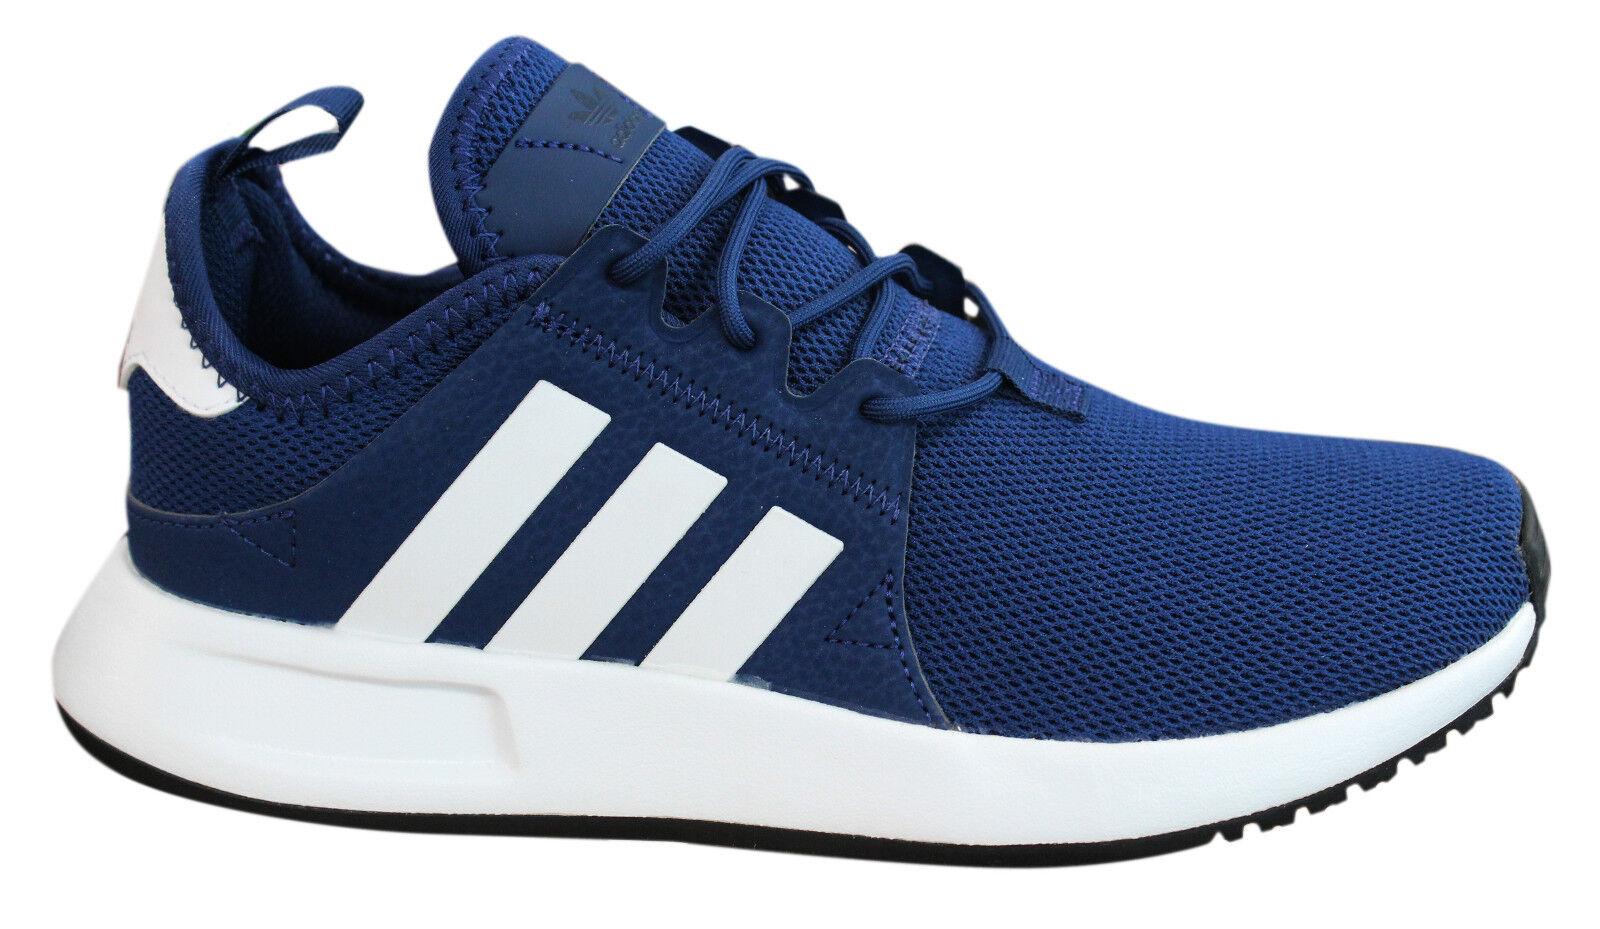 Adidas Originals X_PLR Mens Trainers Lace Up shoes bluee Textile Mesh BY8689 M17